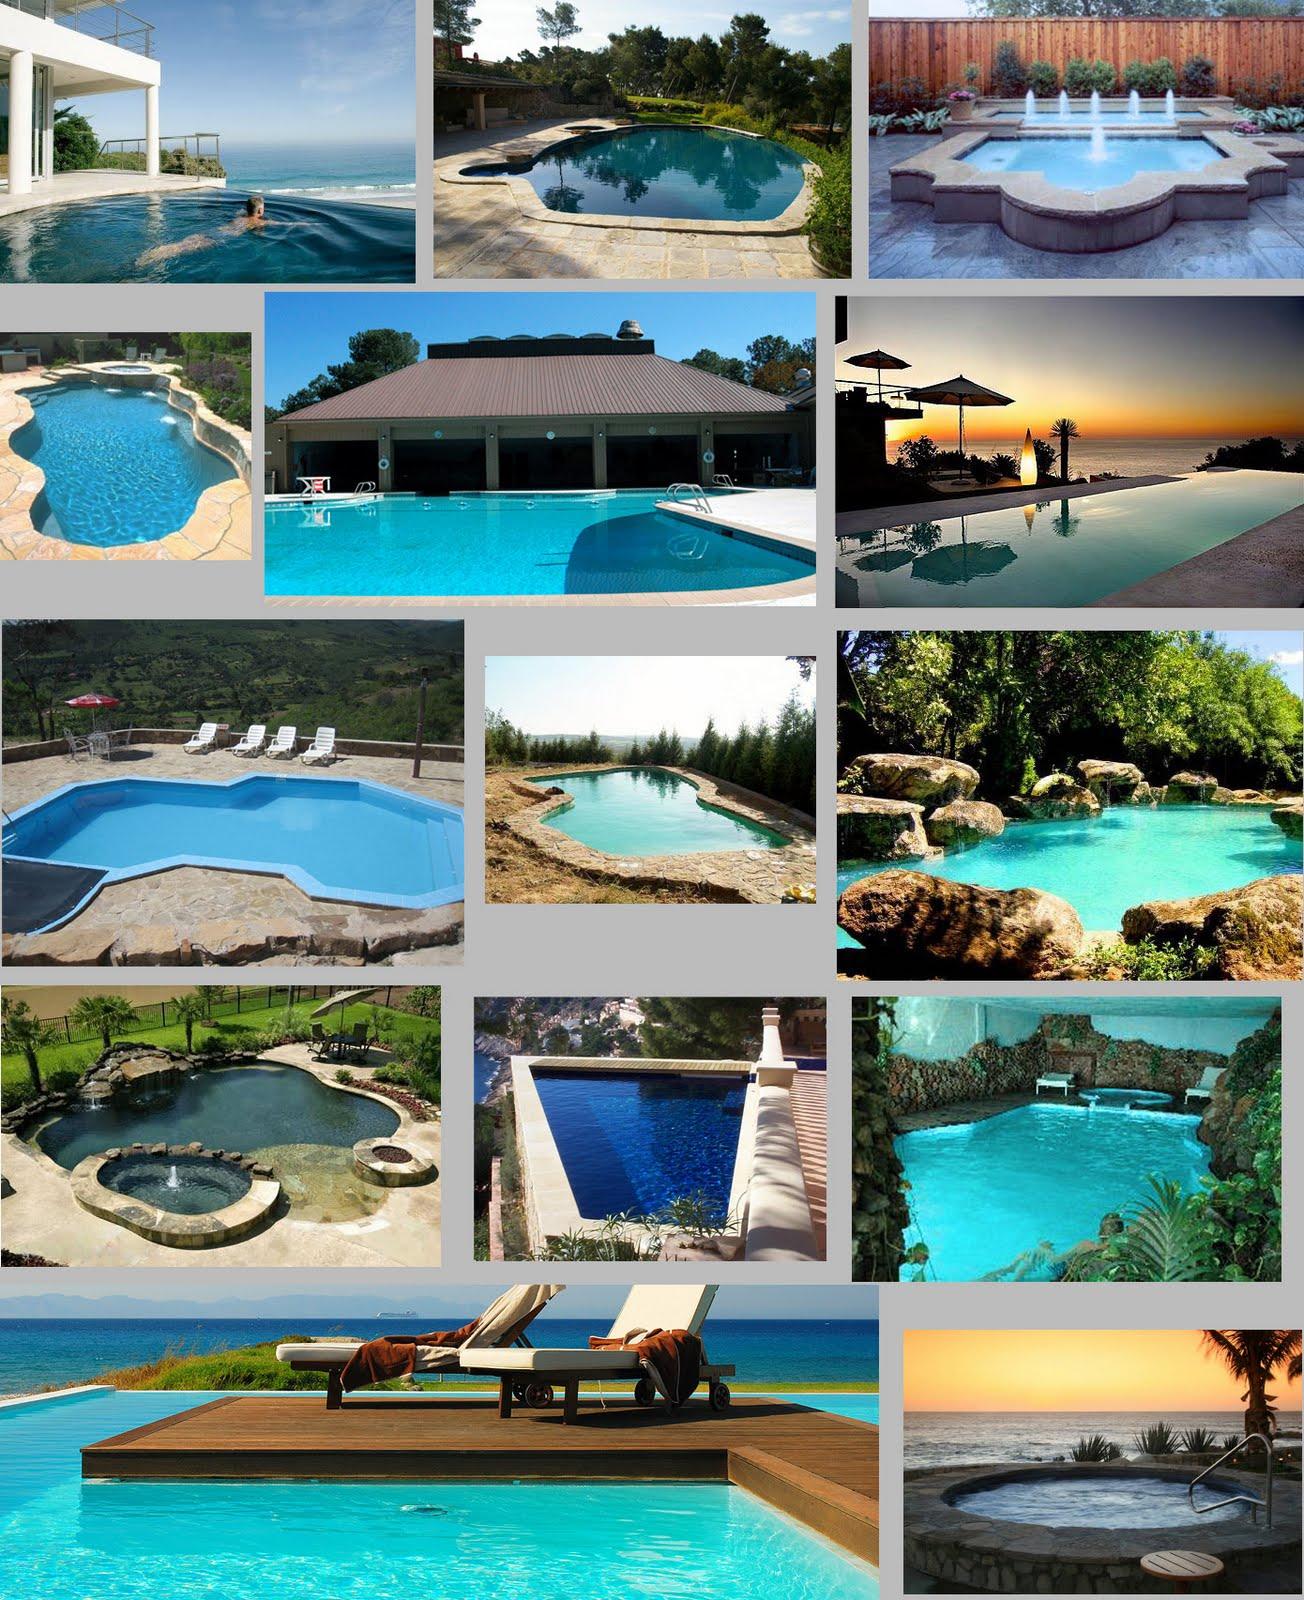 Am piscinas particulares for Piscinas particulares